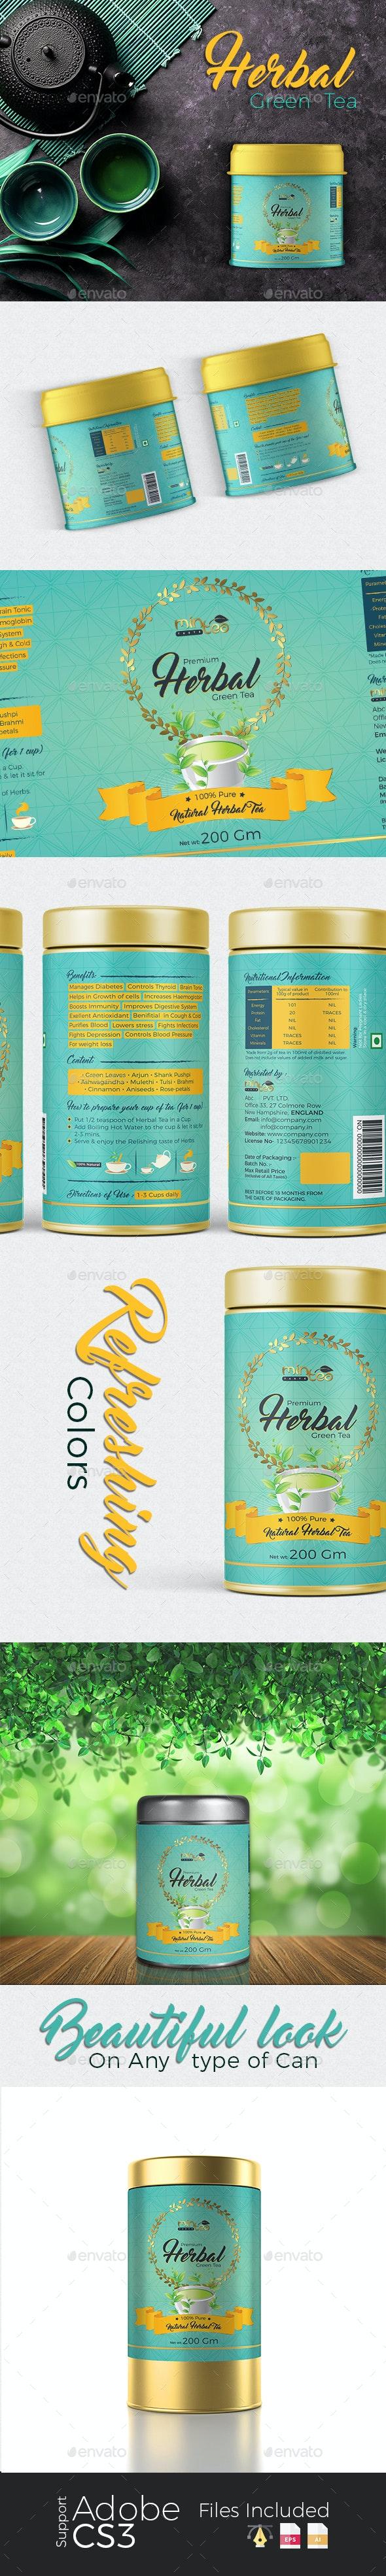 Herbal Green Tea Label - Packaging Print Templates